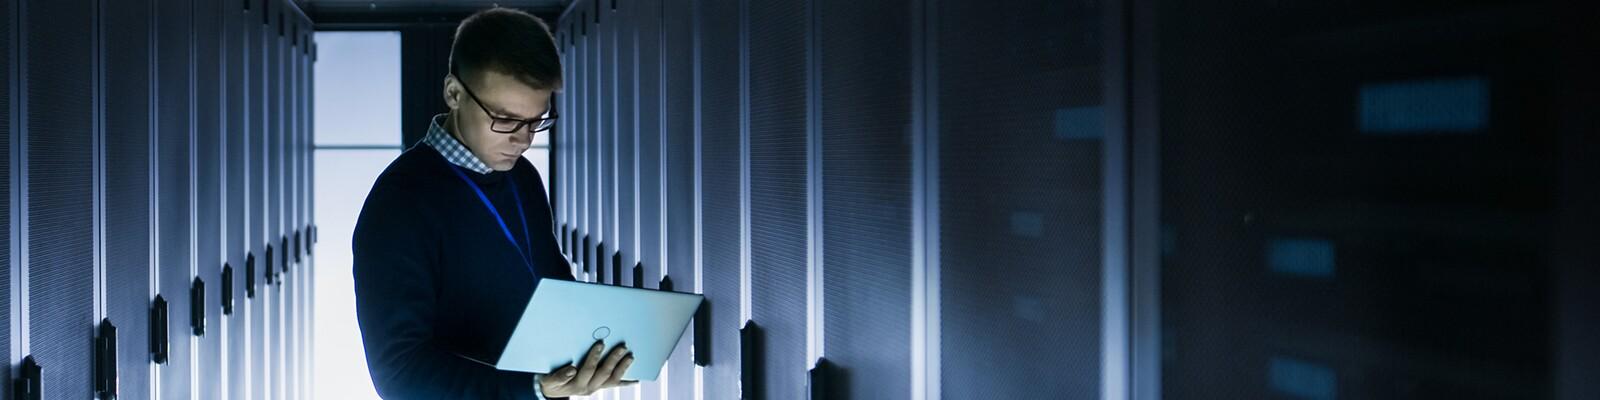 man-on-laptop-in-server-room